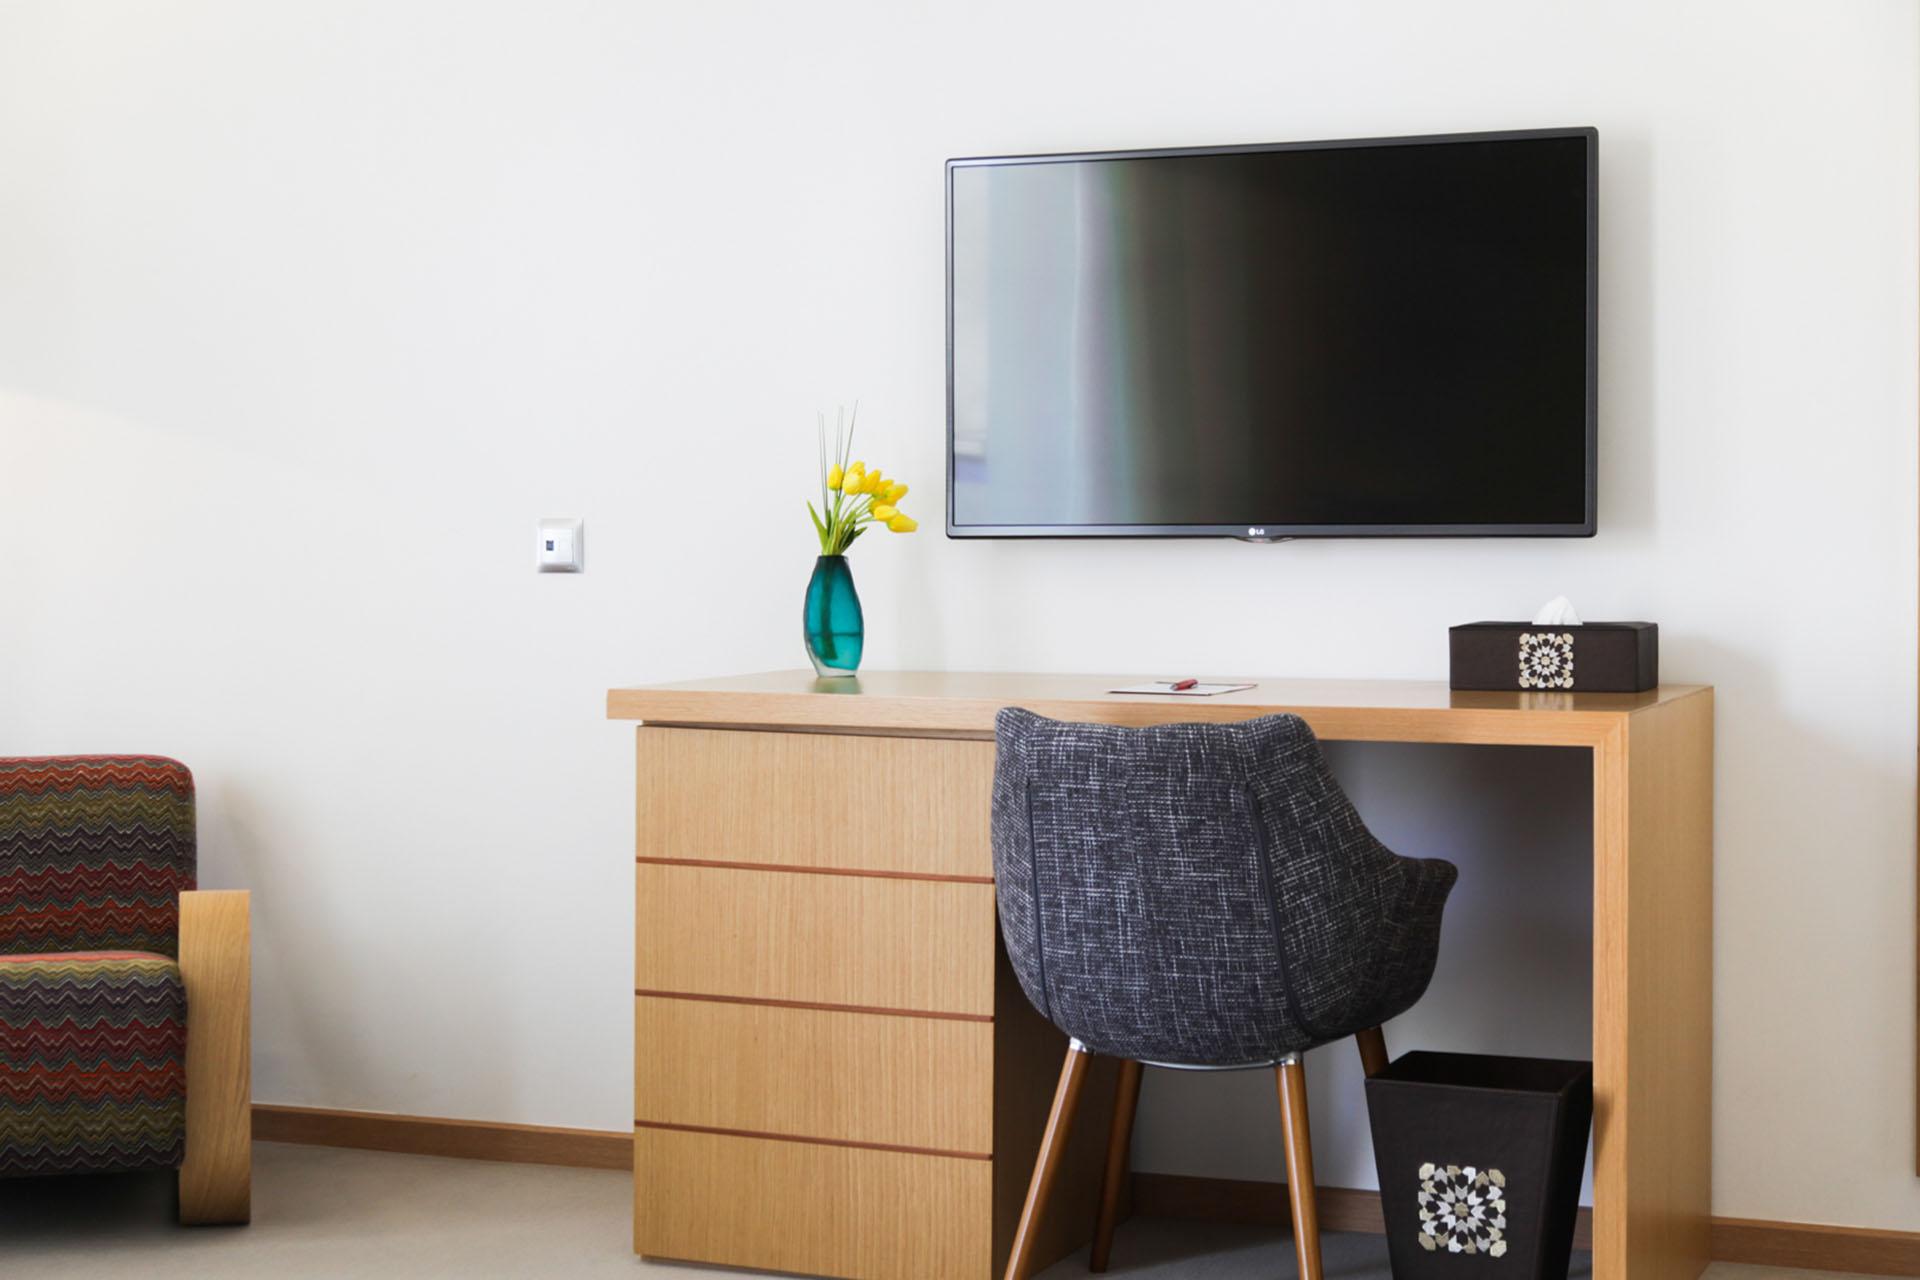 http://smartshotel.com/wp-content/uploads/2016/10/Superior-Room-Working-Desk.jpg